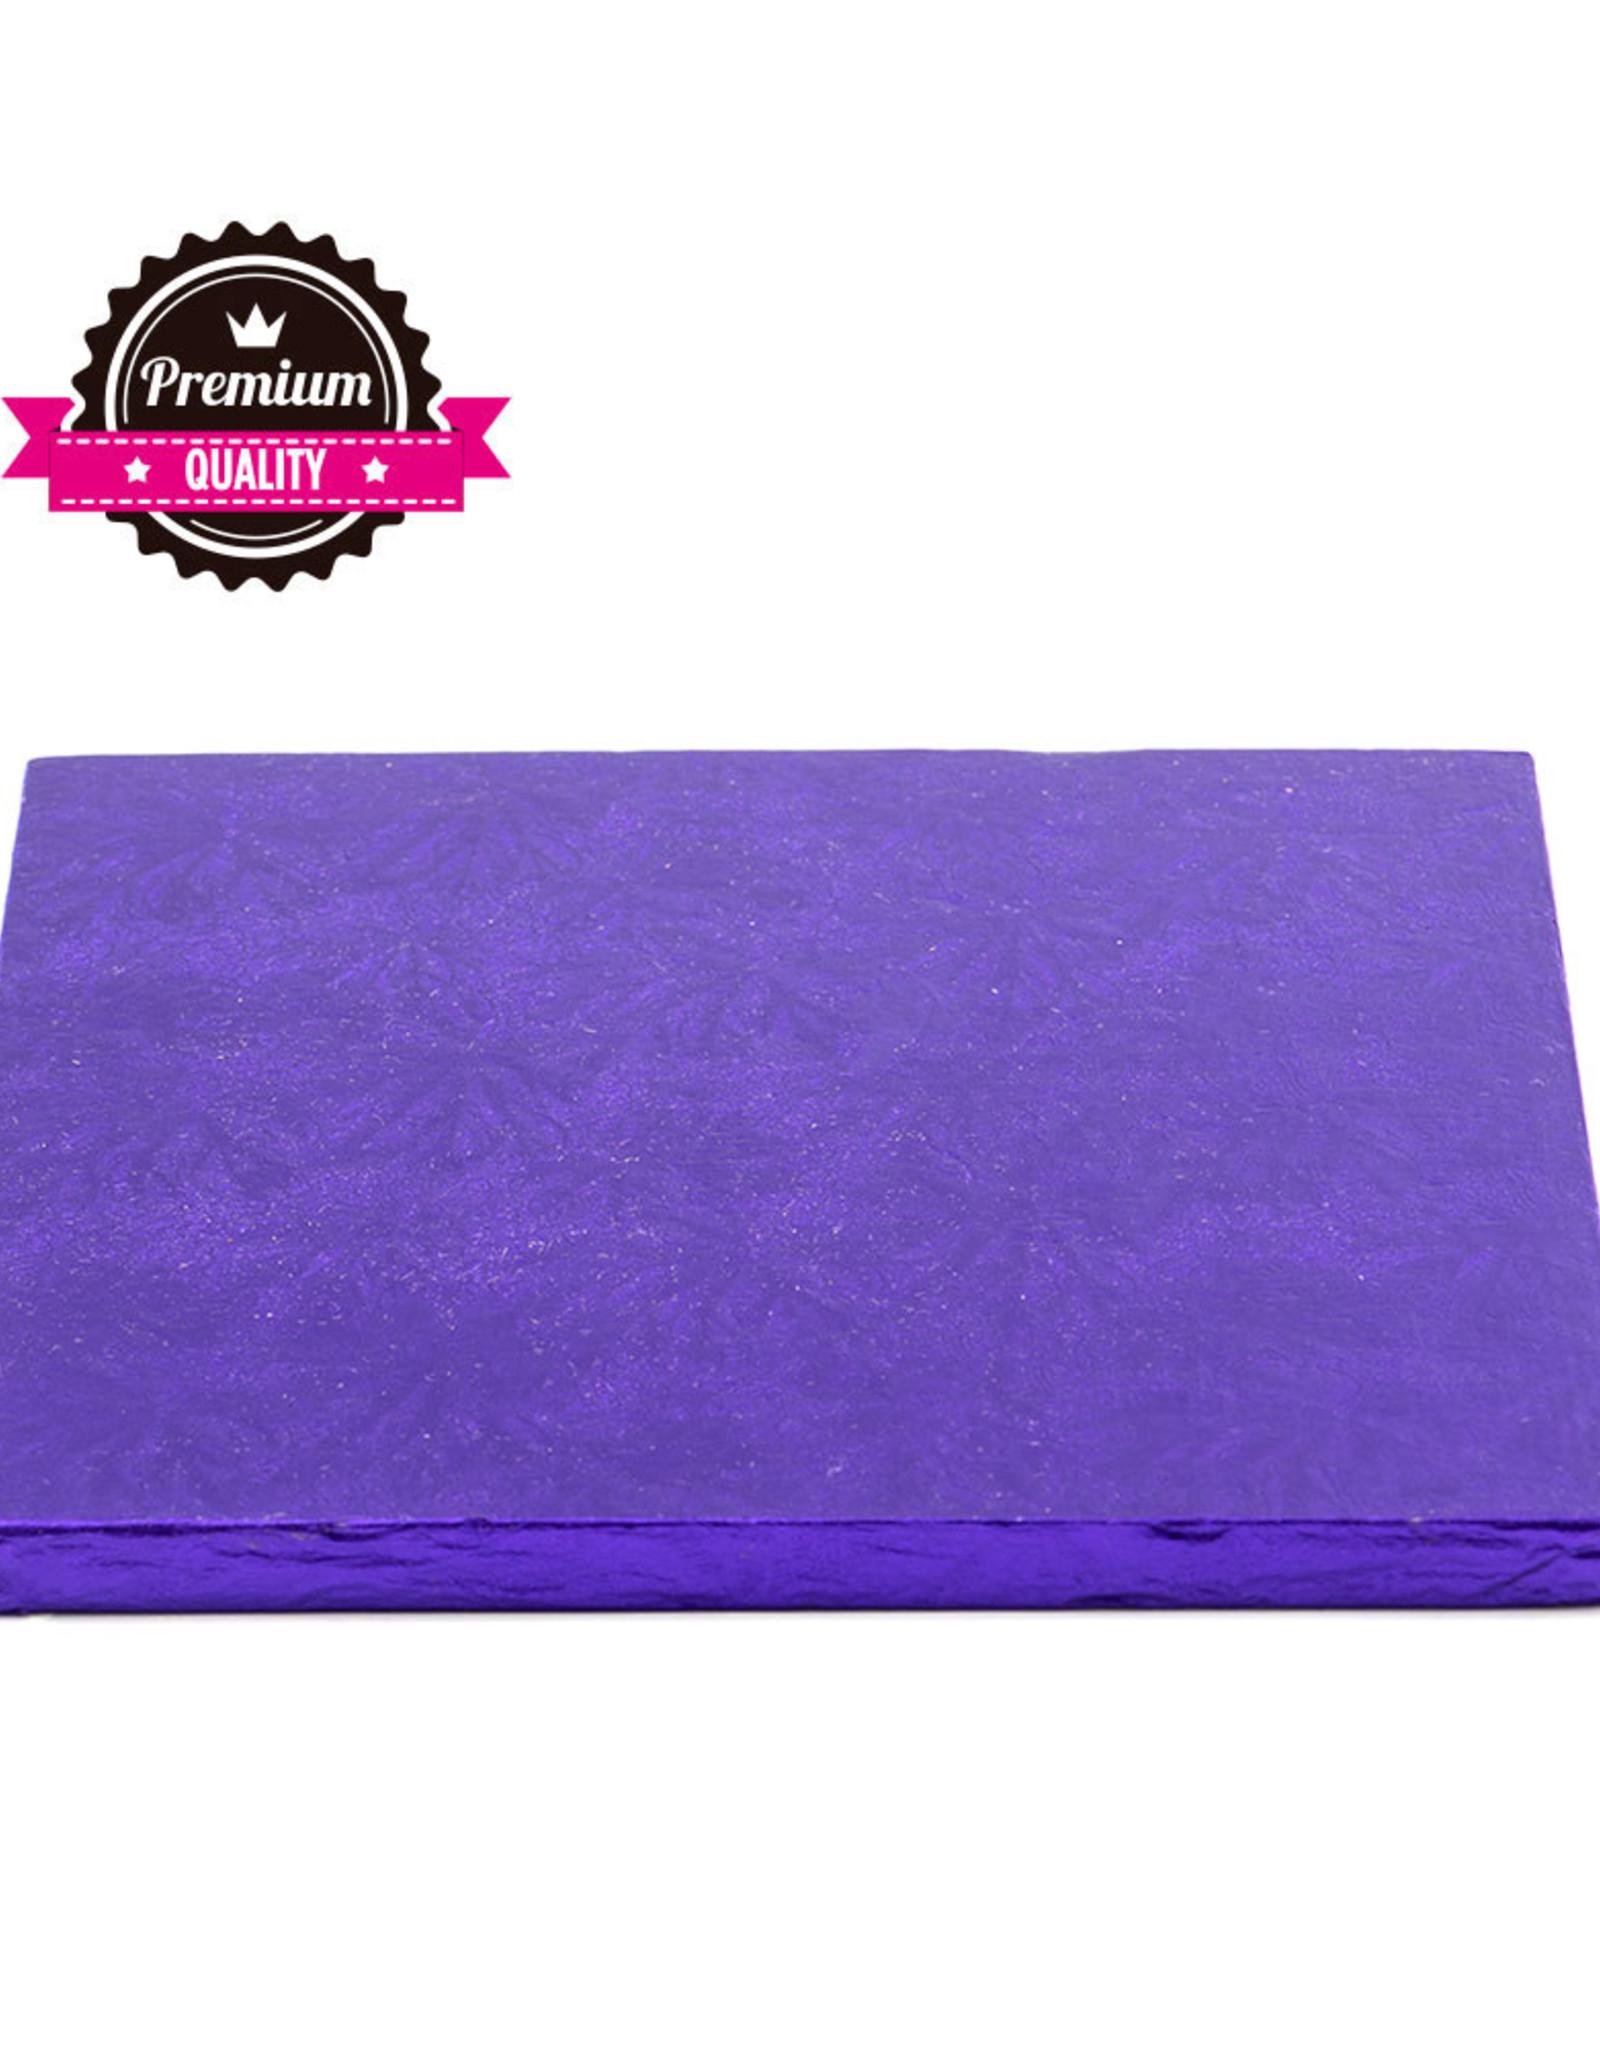 Decora Cake Drum Vierkant 30cm Violet